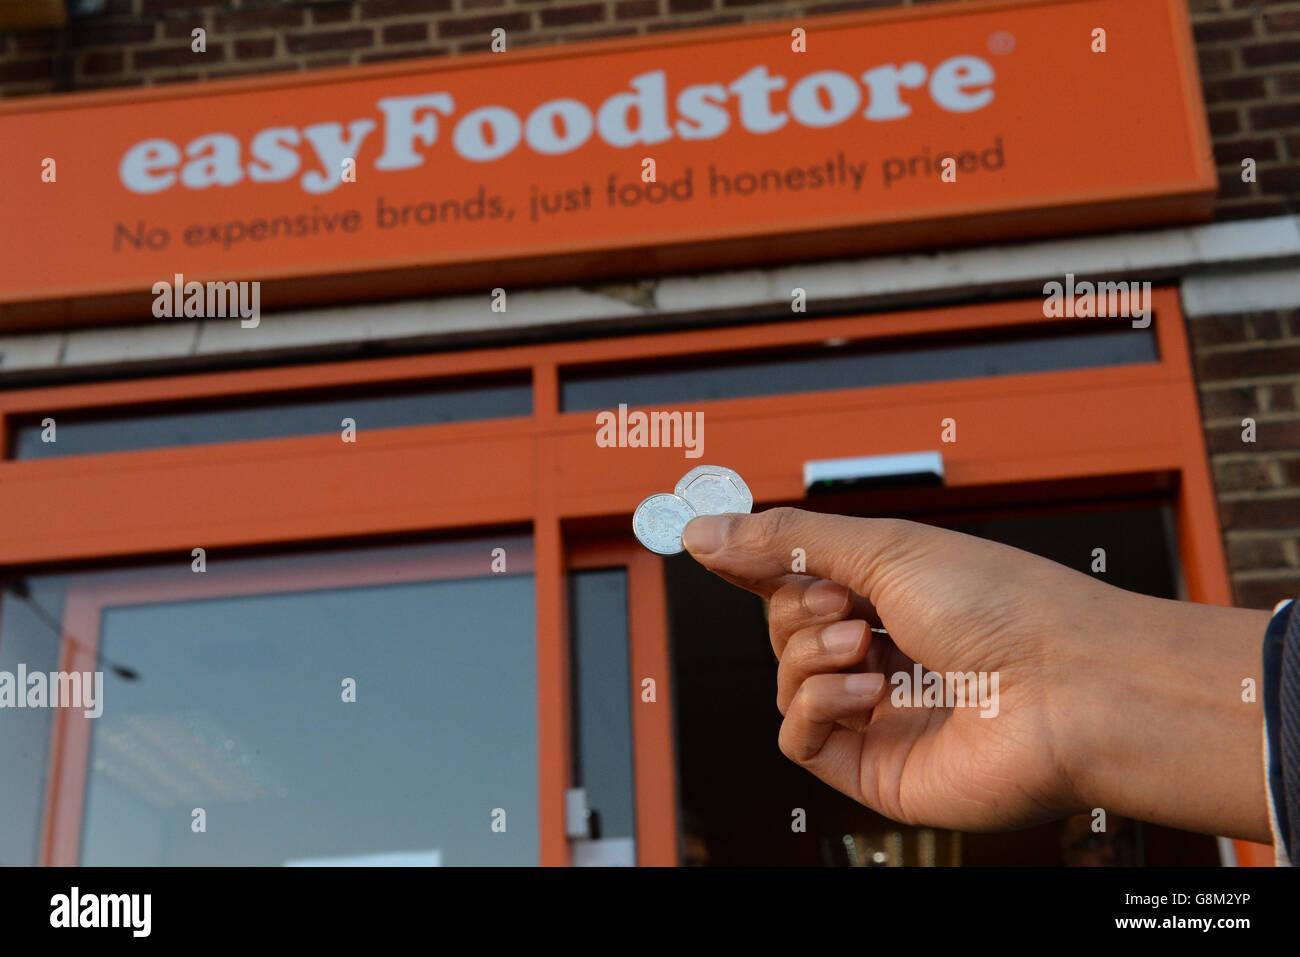 EasyFoodstore launch - Stock Image